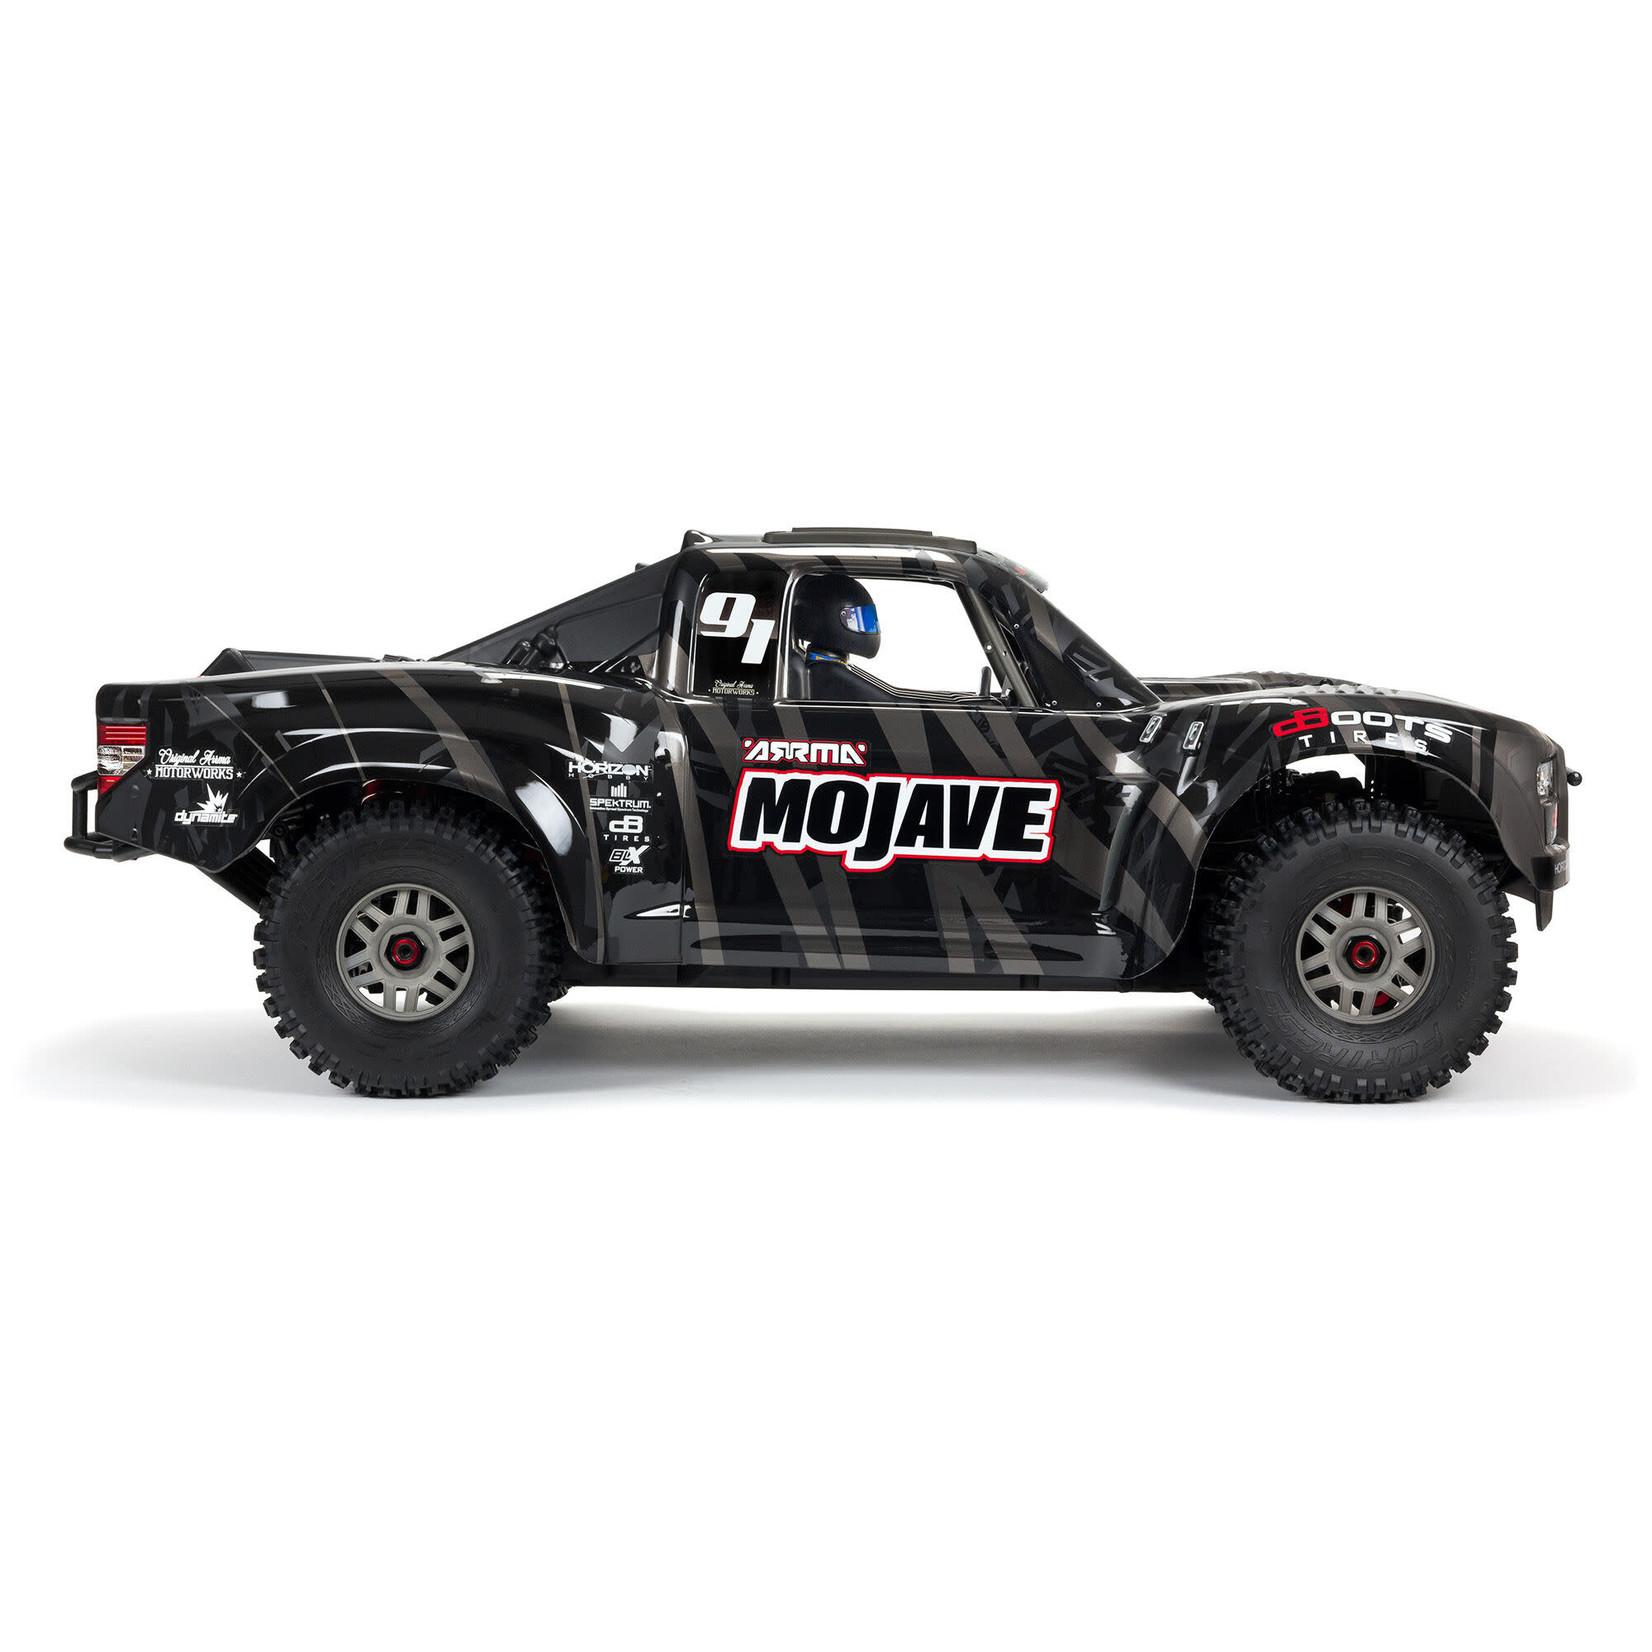 ARRMA ARA7204 Arrma Mojave 1/7th 4WD EXtreme Bash Roller Black